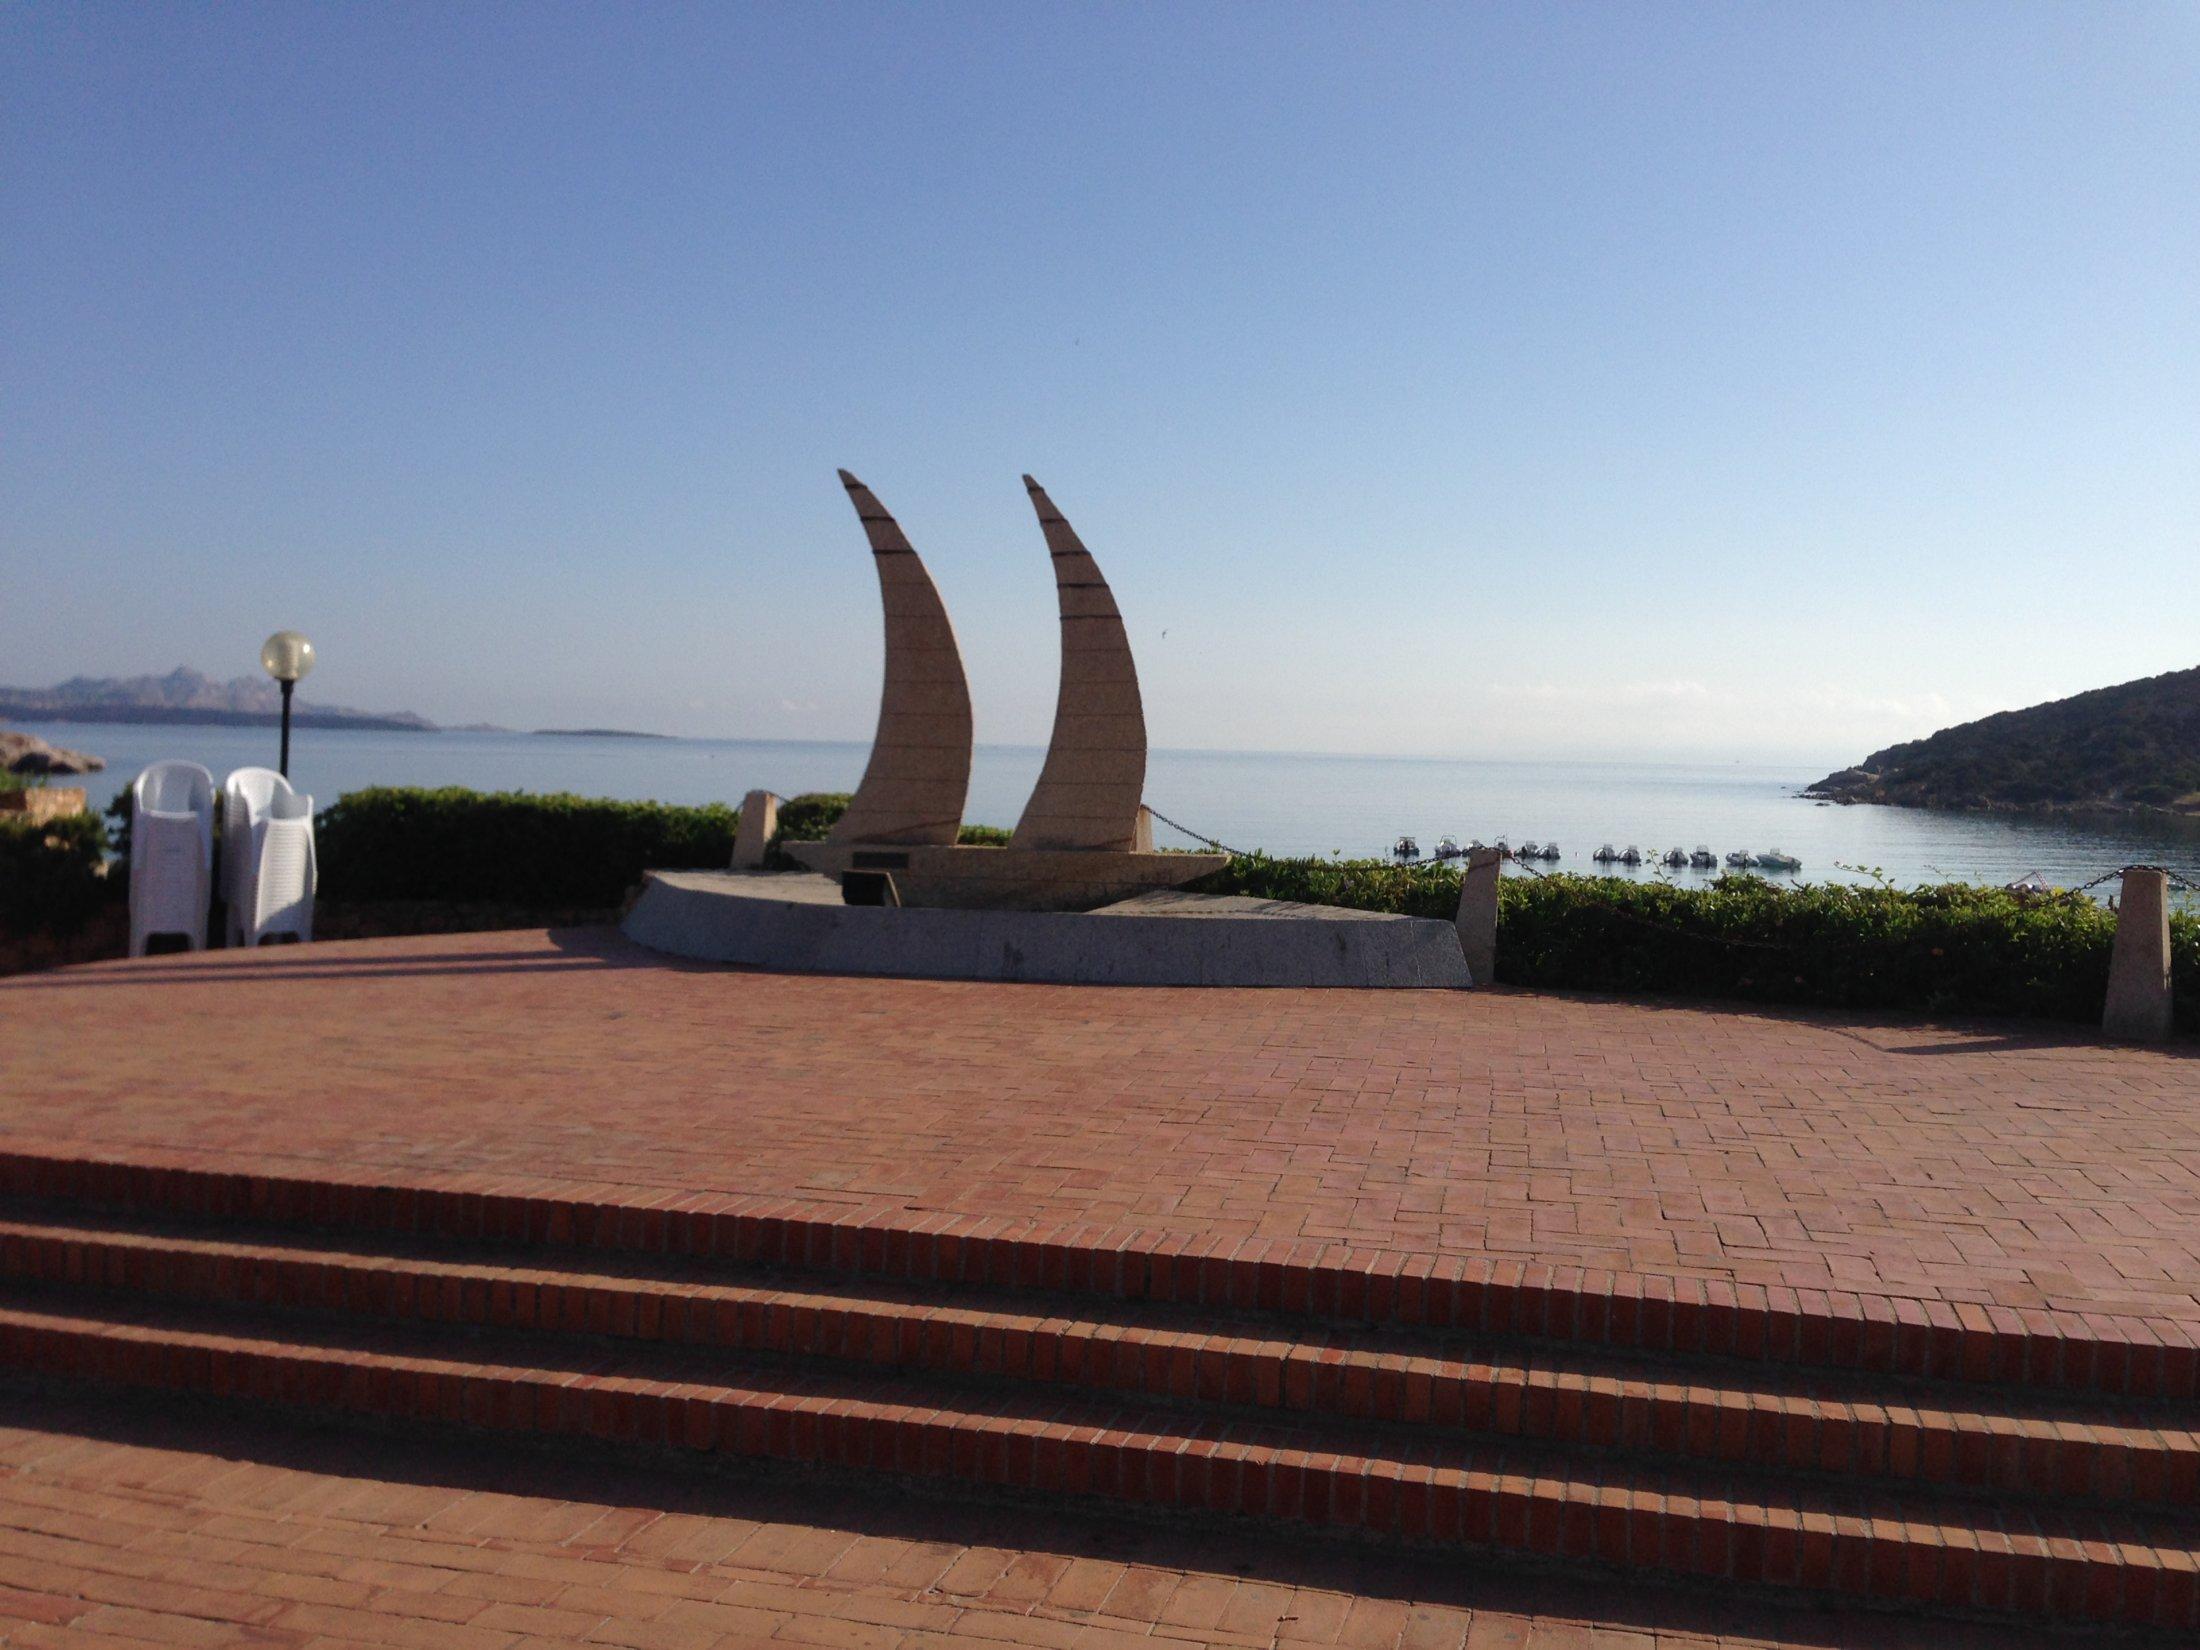 Baja Sardinia, Piazzetta due vele